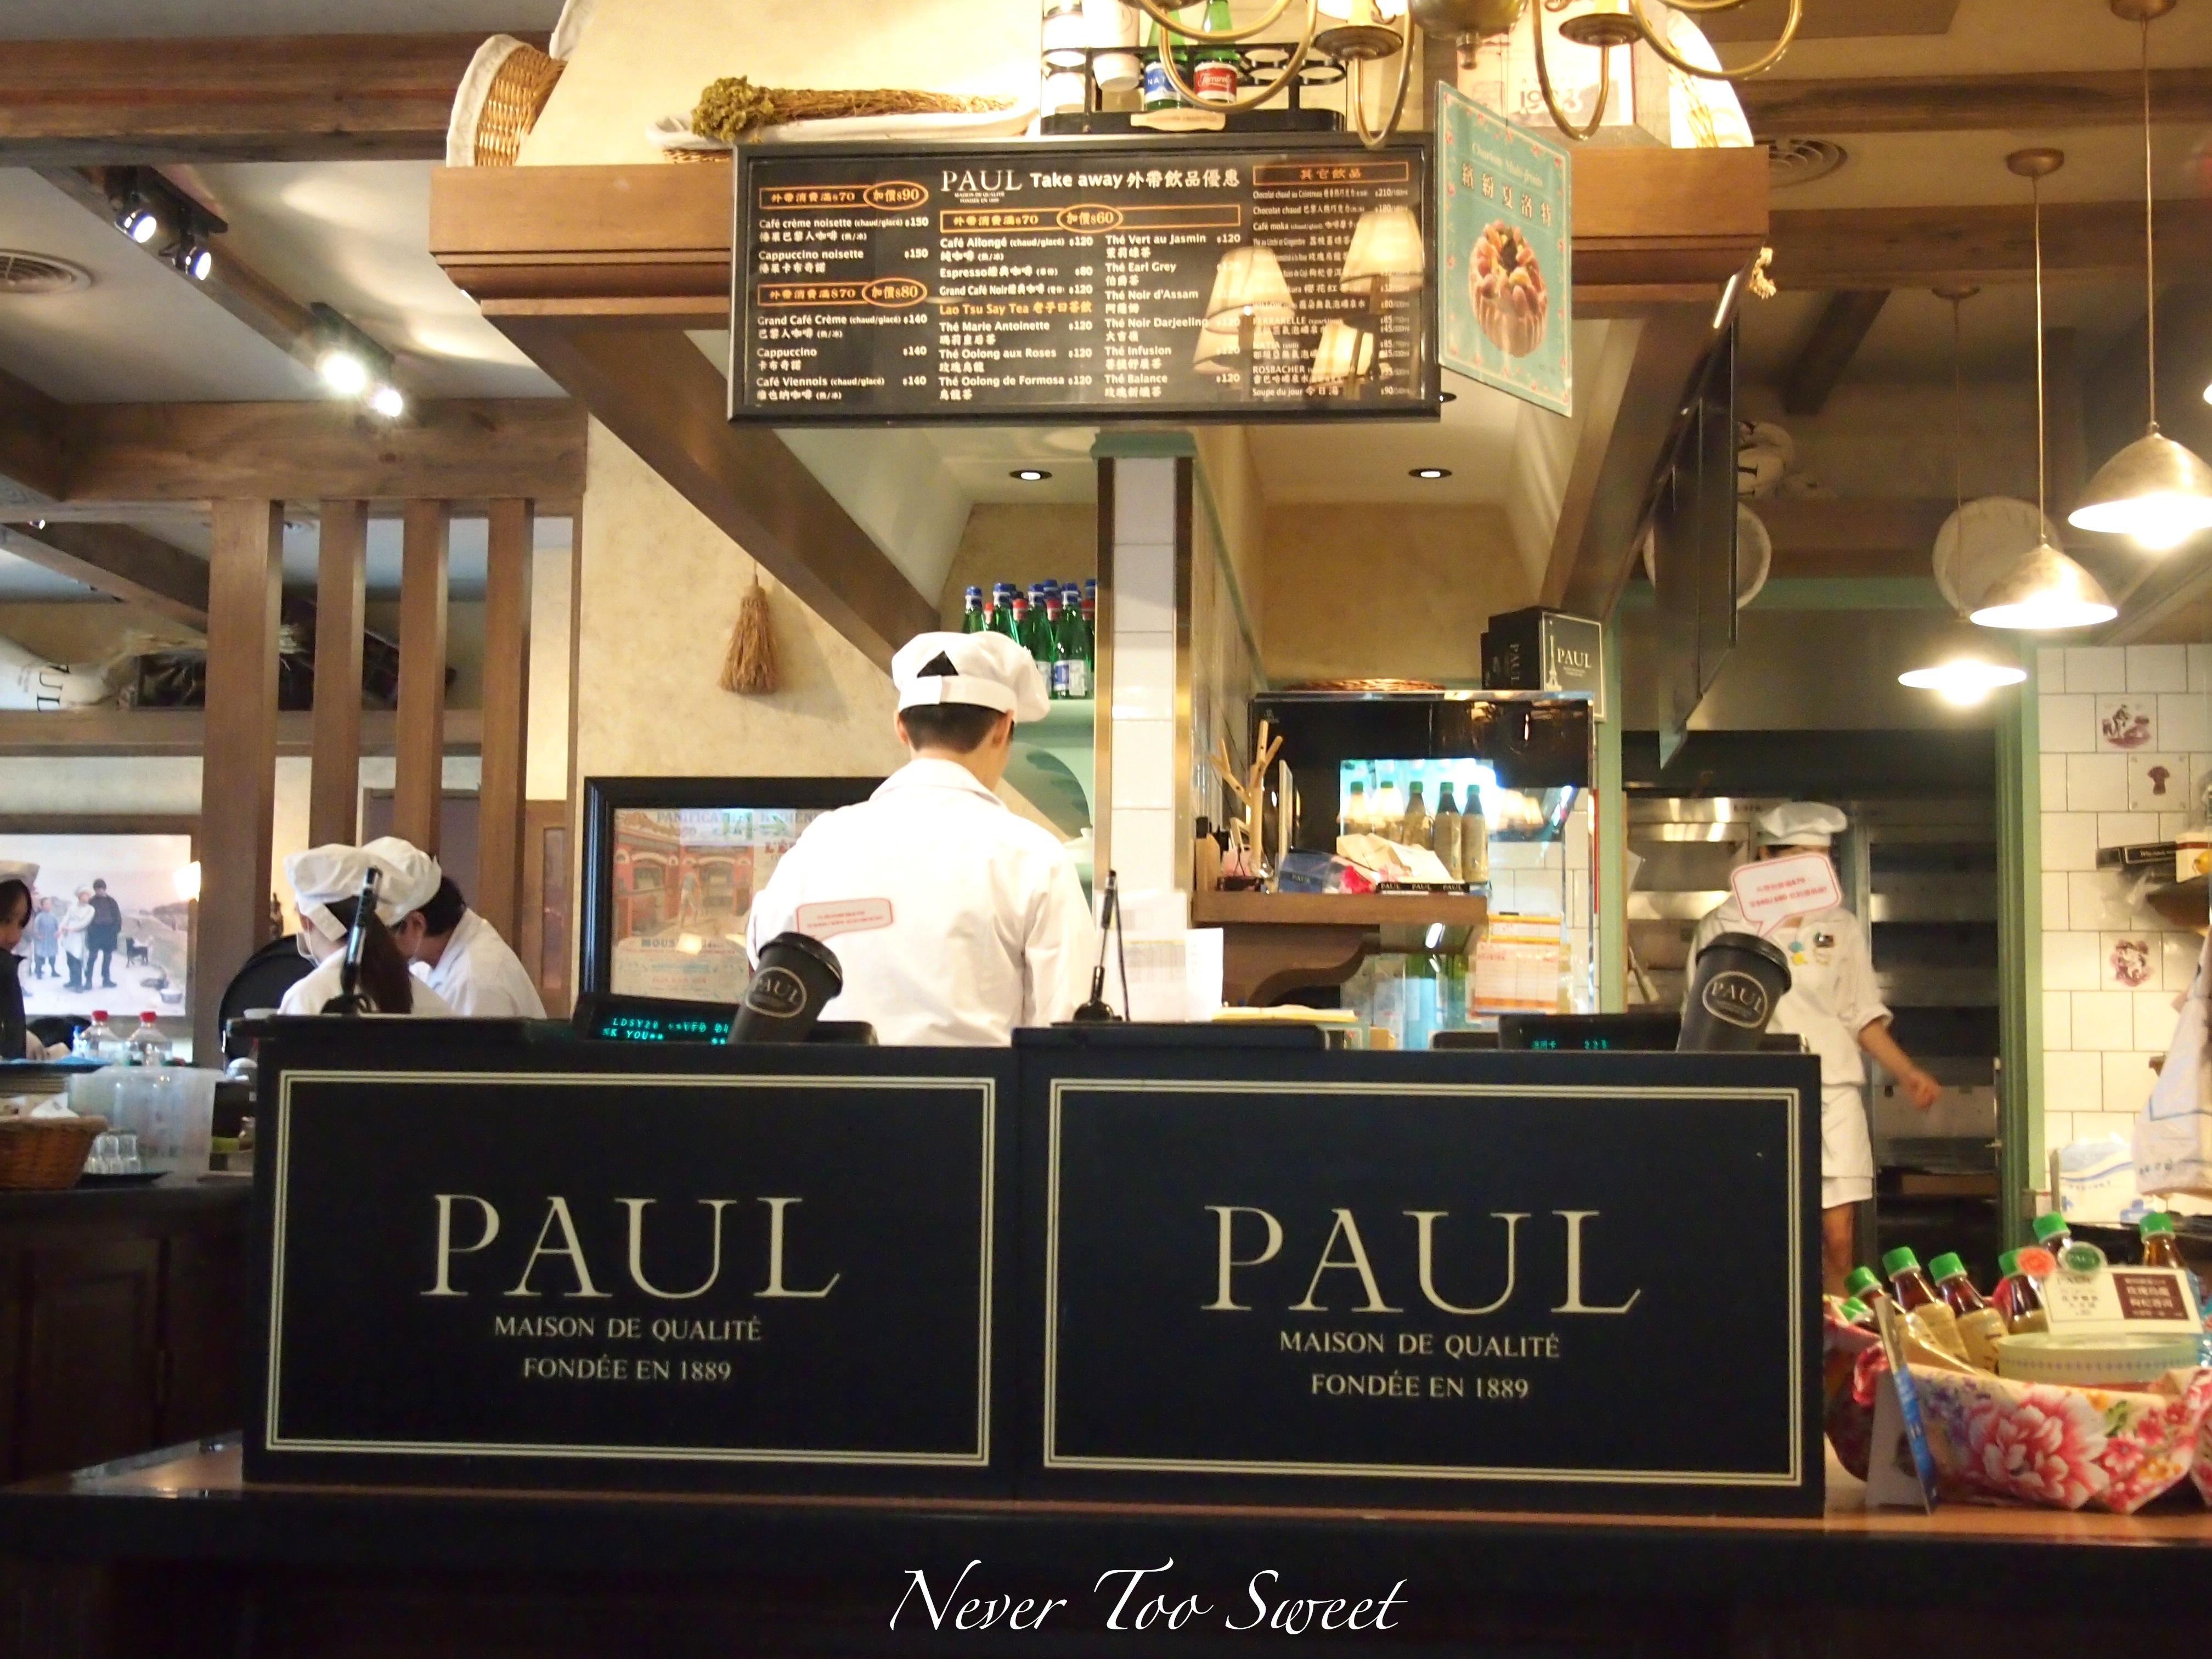 Paul Maison De Qualite London Ventana Blog Source Time